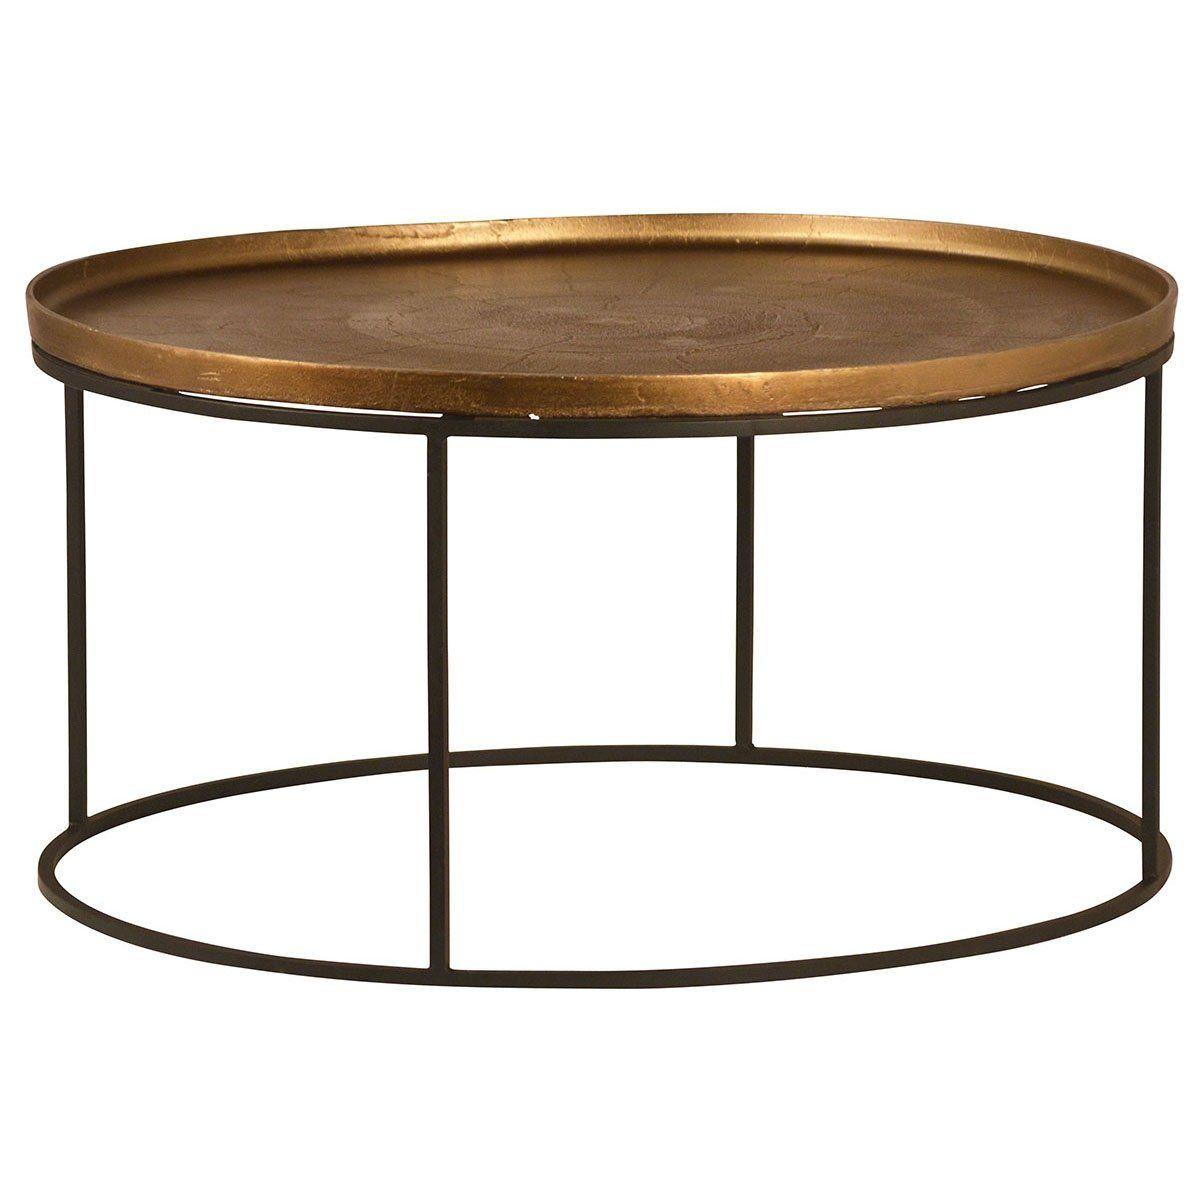 Dovetail Penley Coffee Table Round Black Coffee Table Black Coffee Tables White Round Coffee Table [ 1200 x 1200 Pixel ]